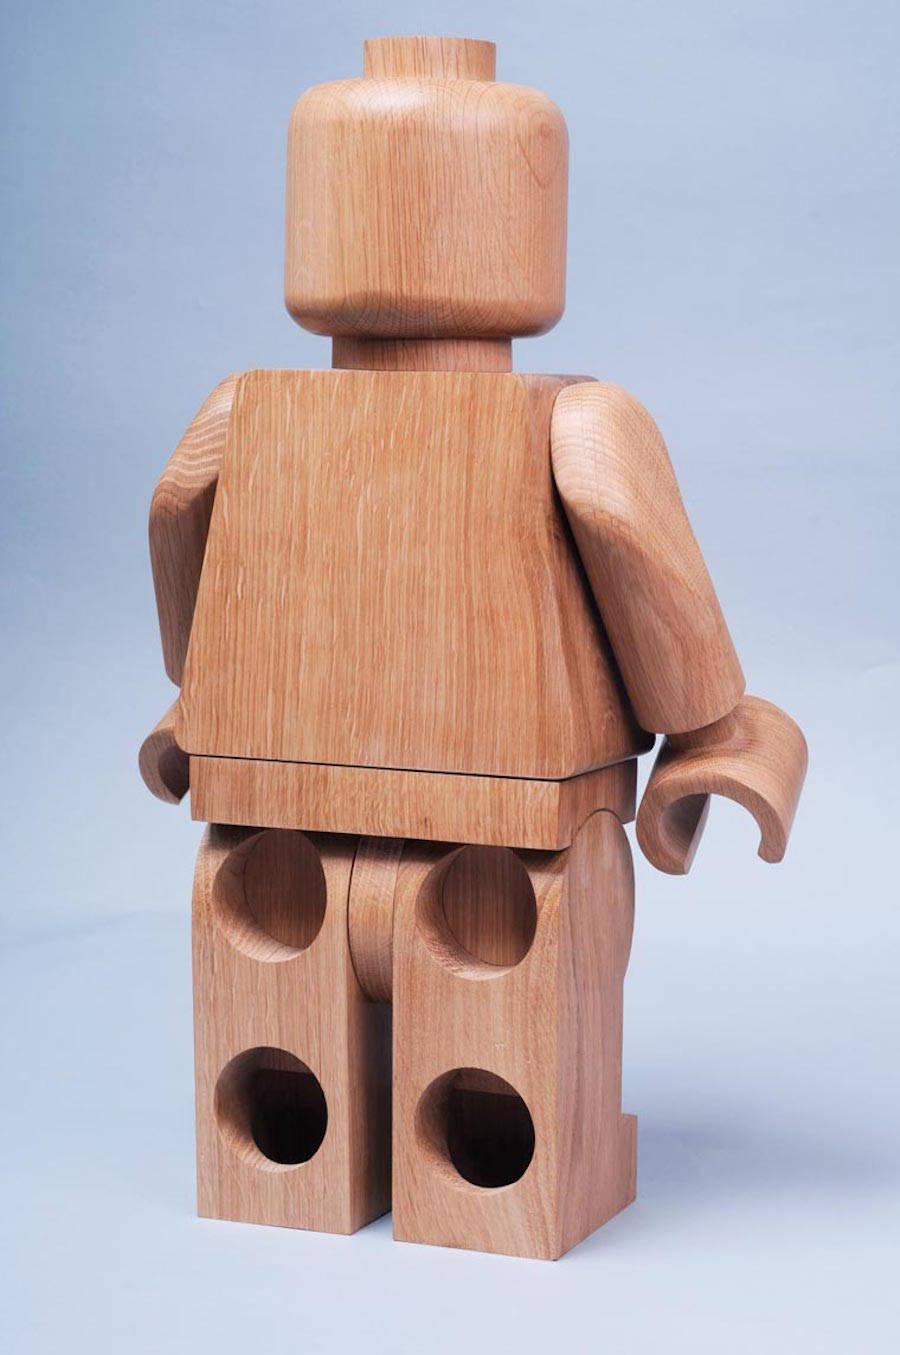 Wooden Lego